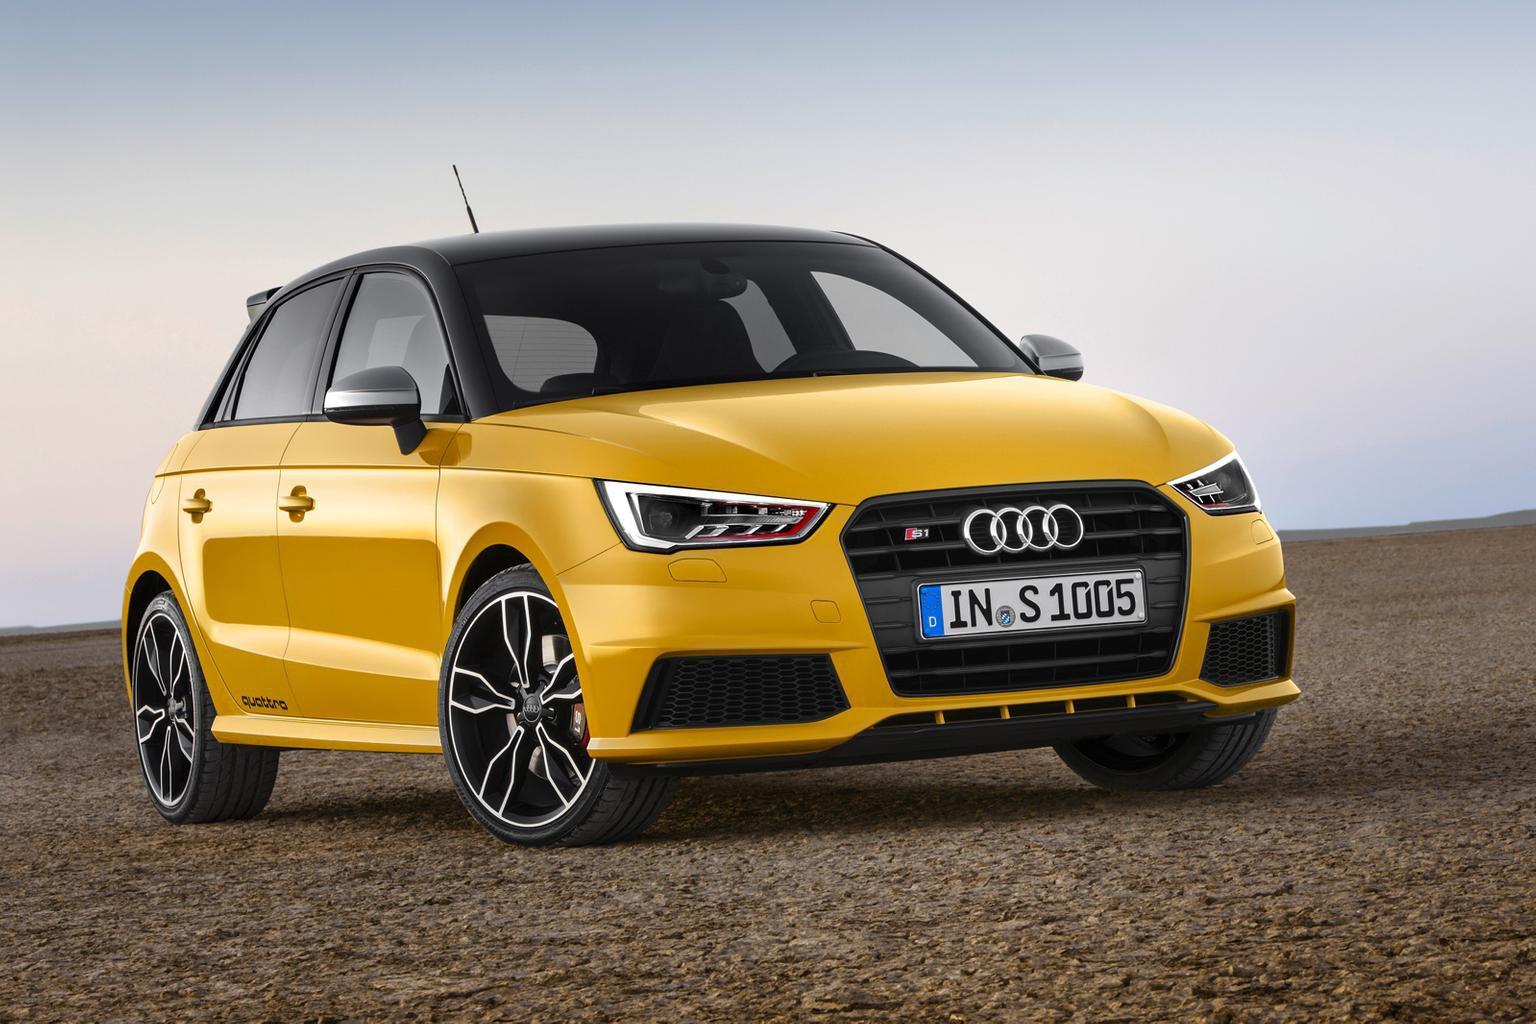 2014 Audi S1 Sportback revealed